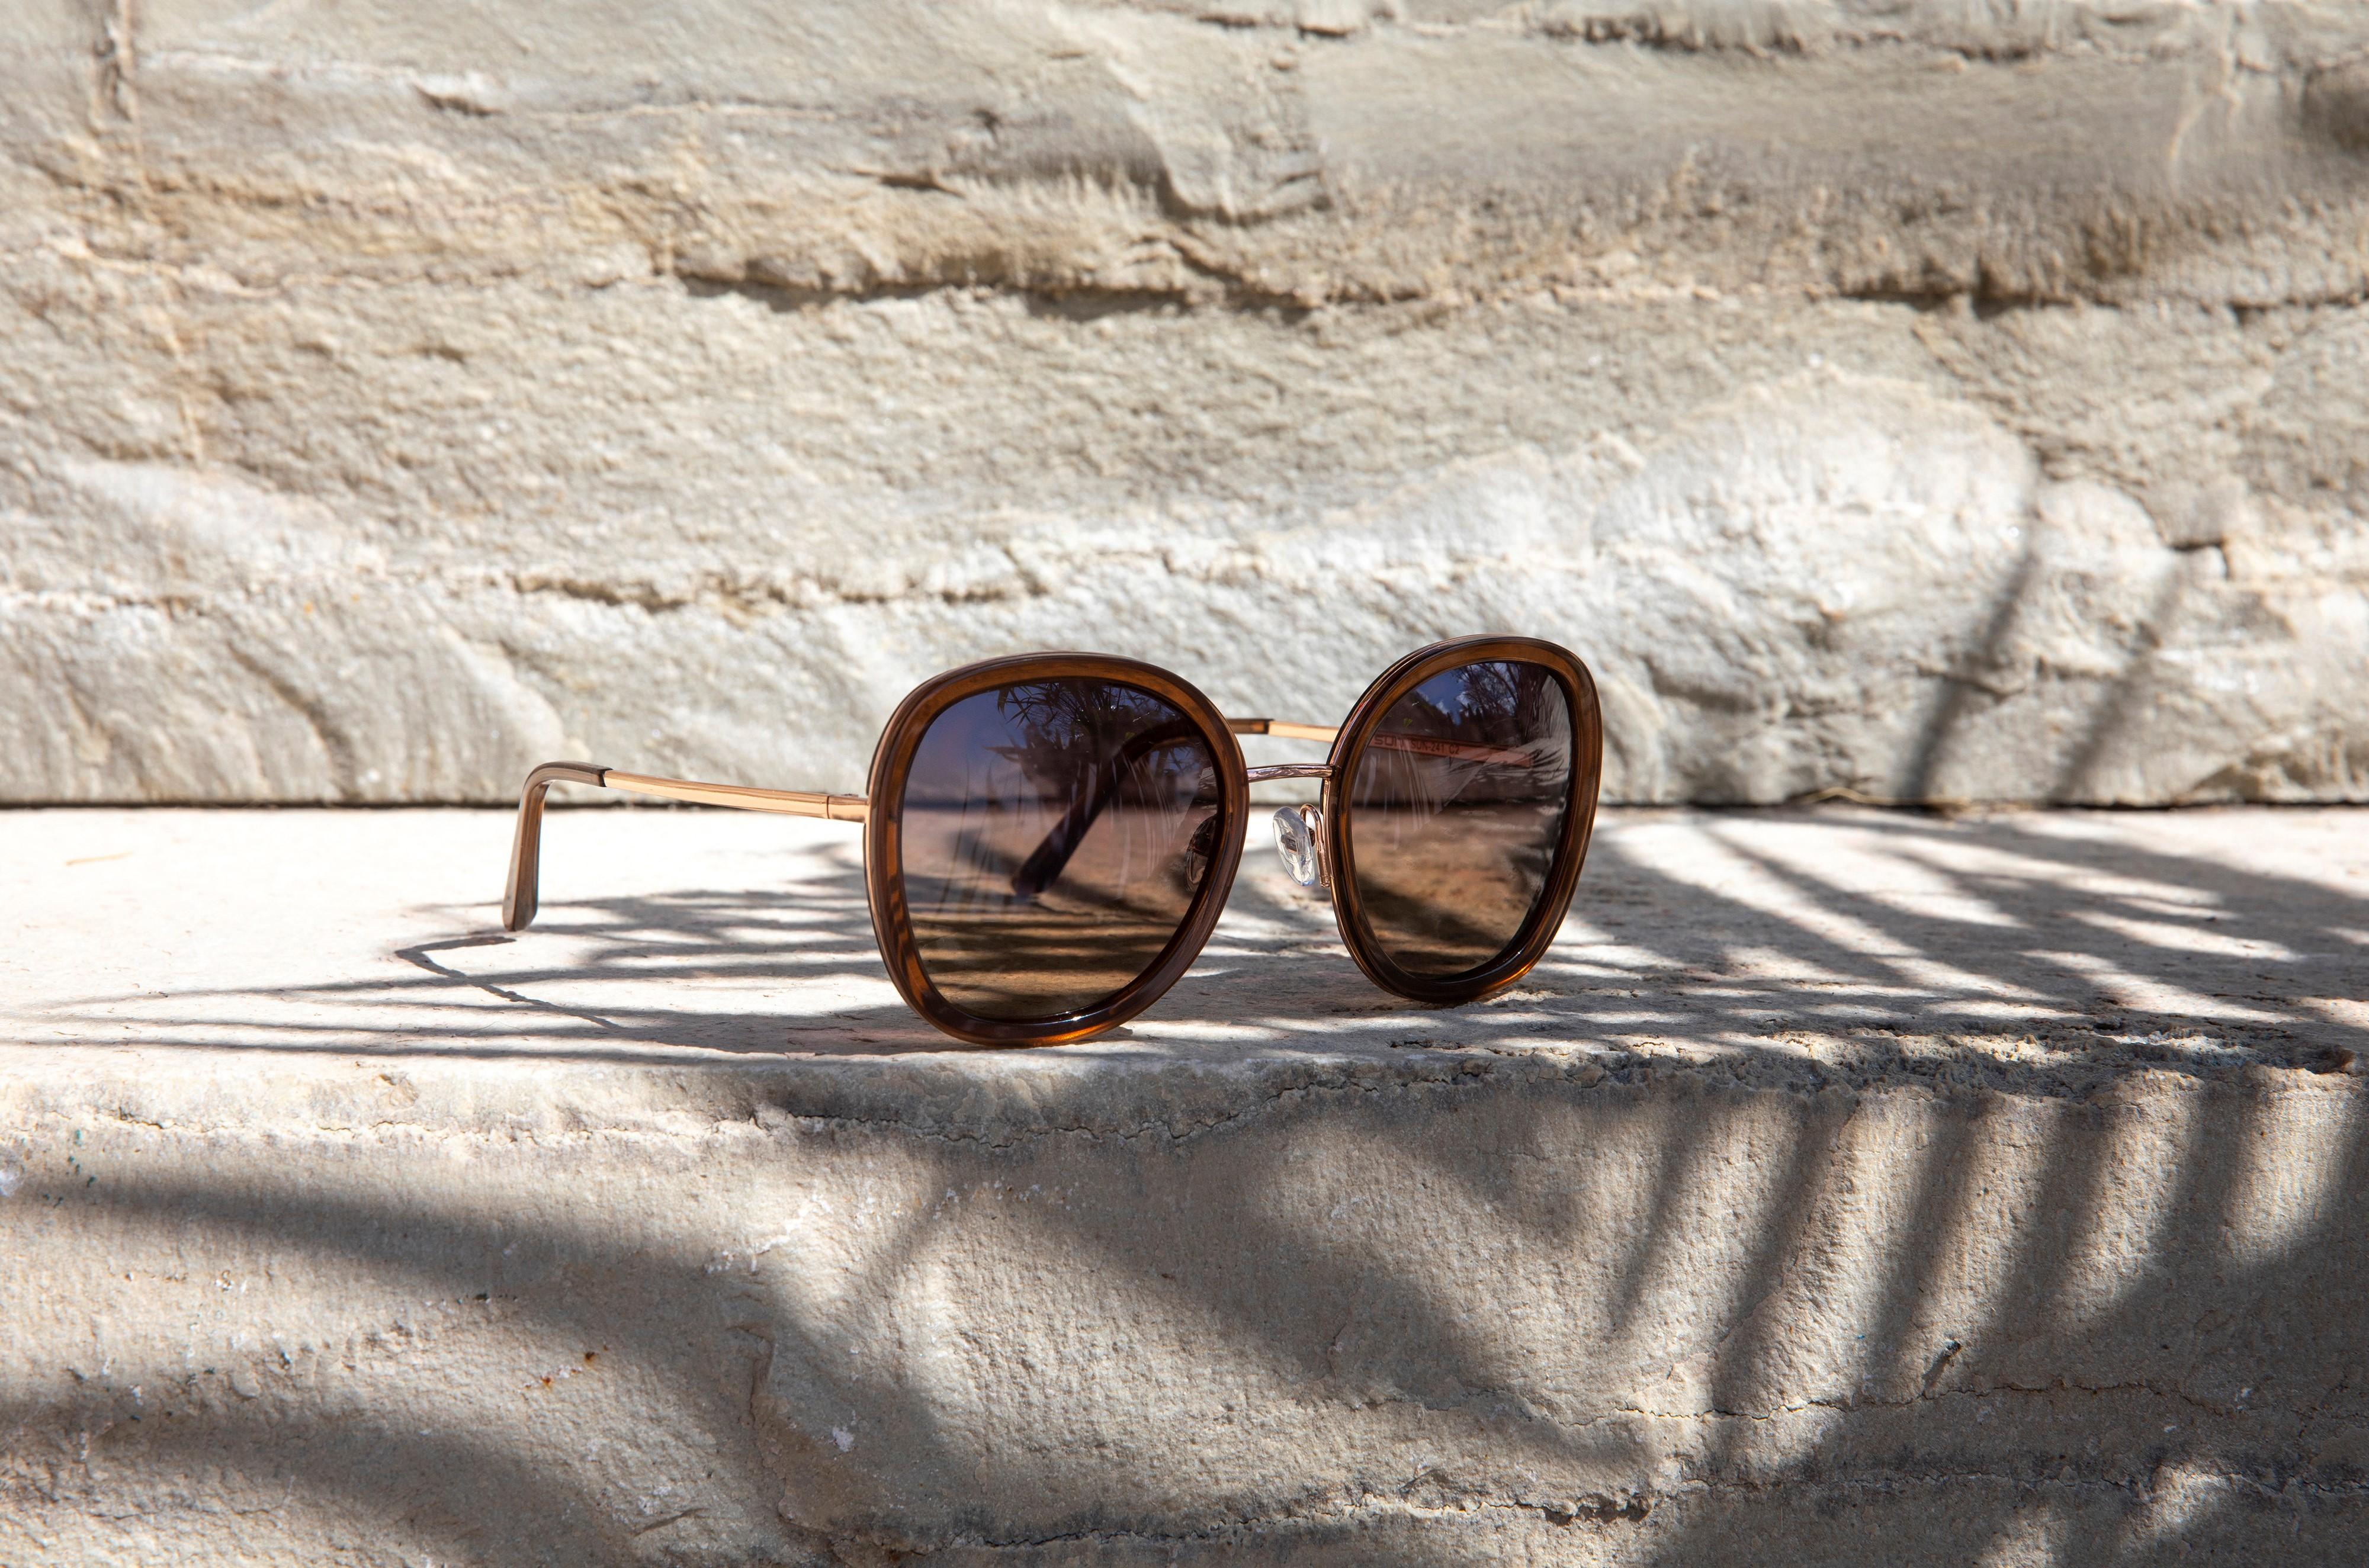 New One Sun Releases from Alternative Eyewear